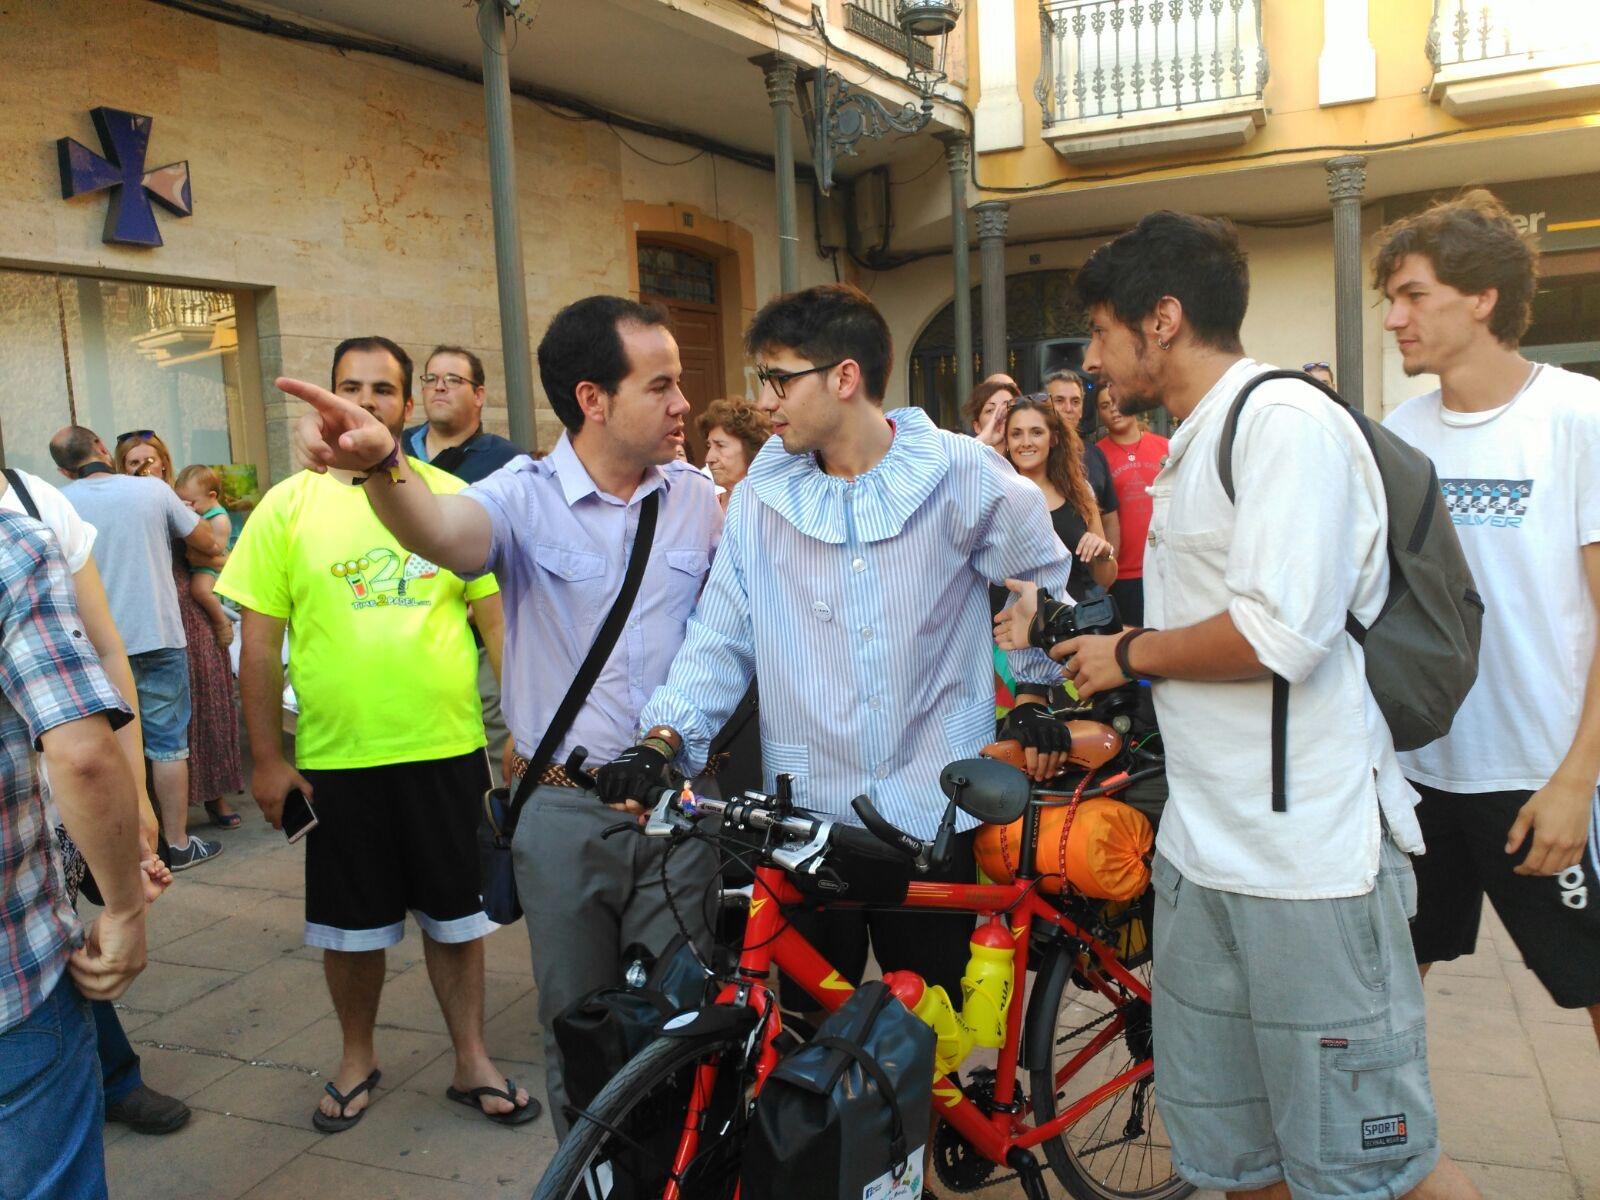 Aventura en bicicleta del Perlé de Herencia